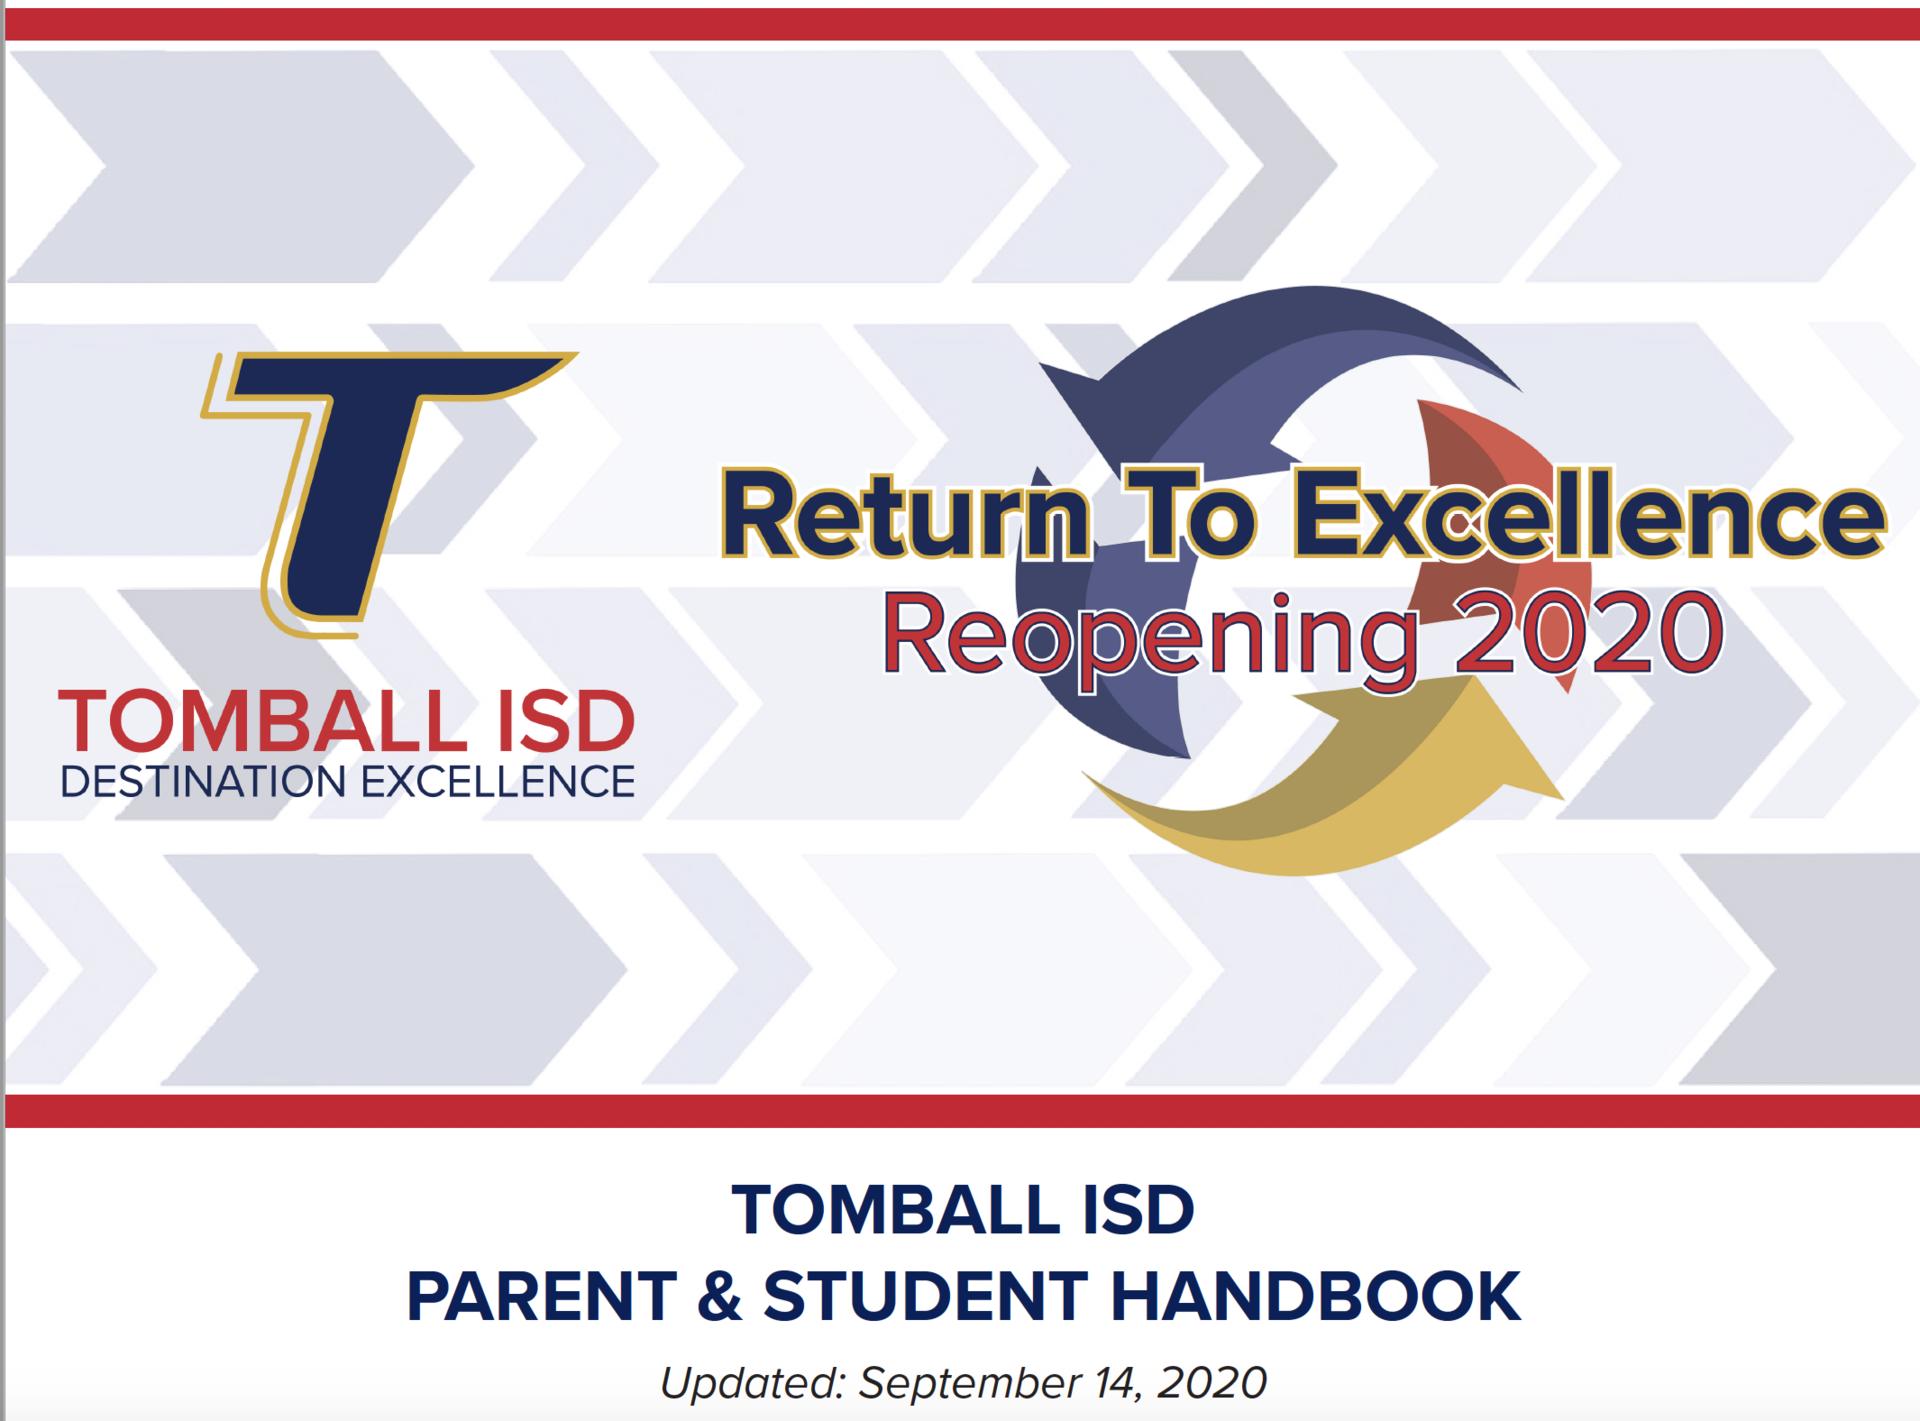 Student & Parent Handbook Cover